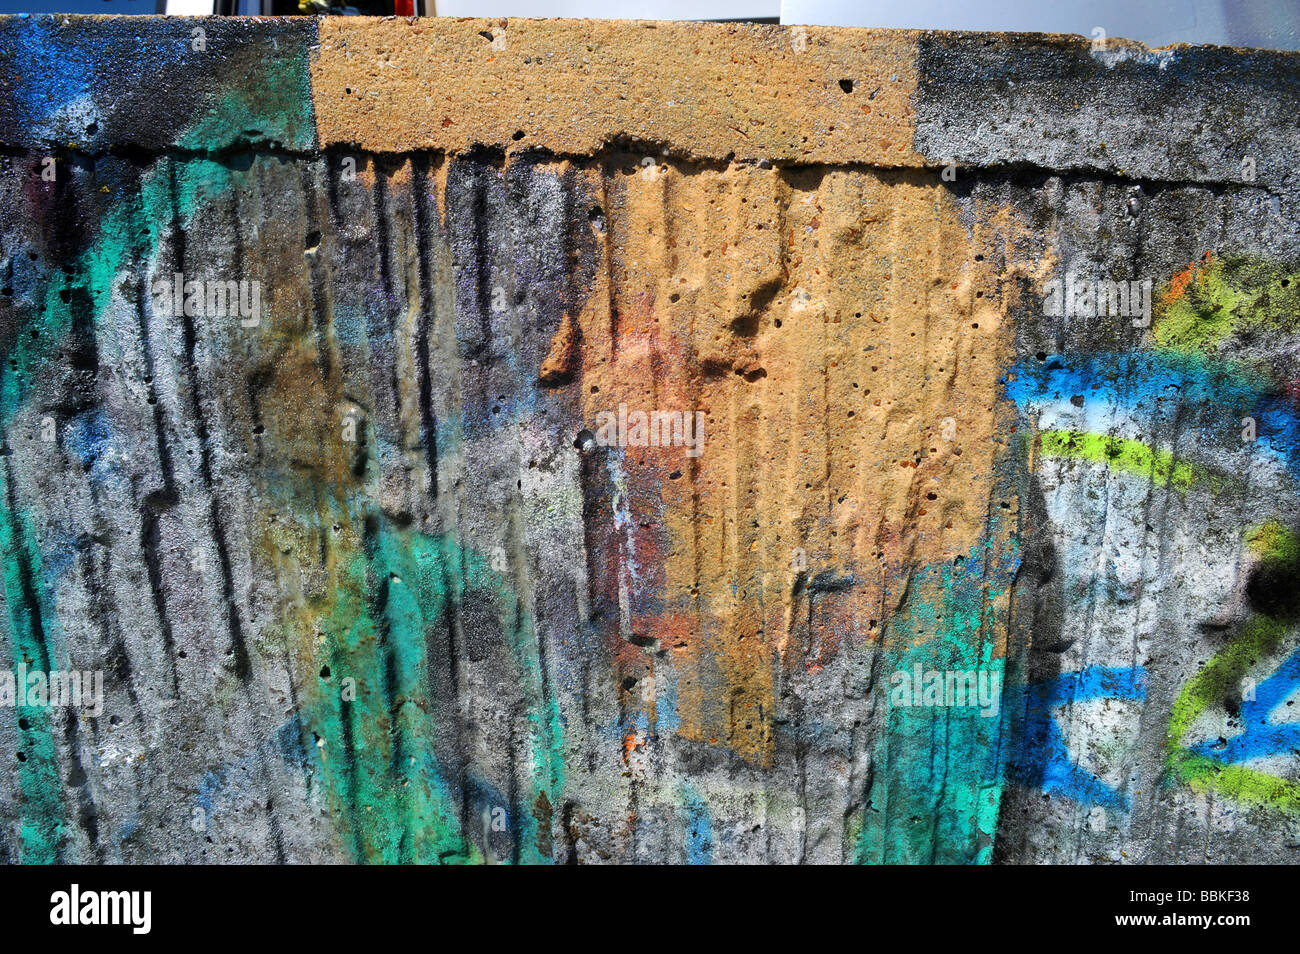 Water Graffiti Stockfotos & Water Graffiti Bilder - Alamy